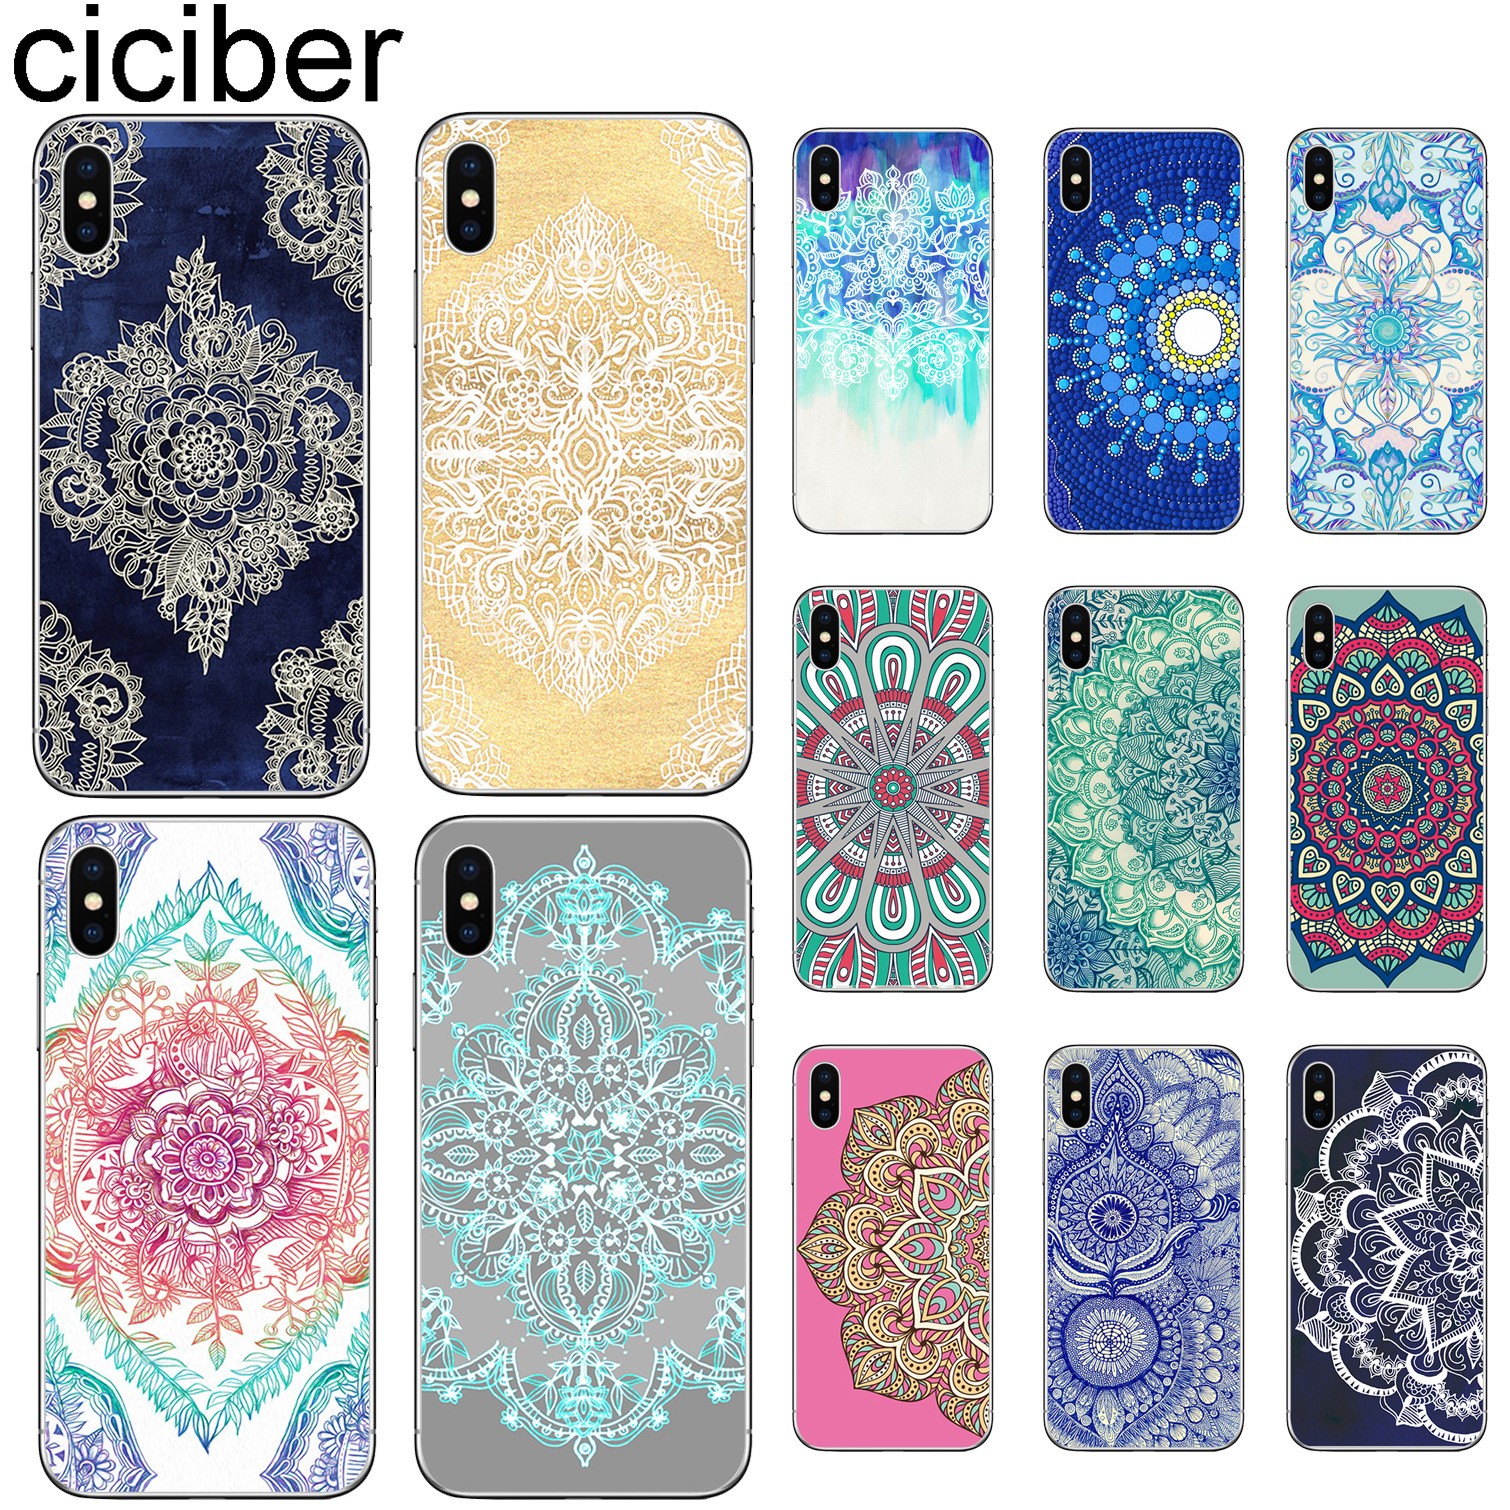 aed219a9d ciciber For Iphone 7 8 6 6S Plus 5S SE X XR XS MAX Clear Cover Soft  silicone TPU Phone Case Mandala Flower Datura Colorful Coque